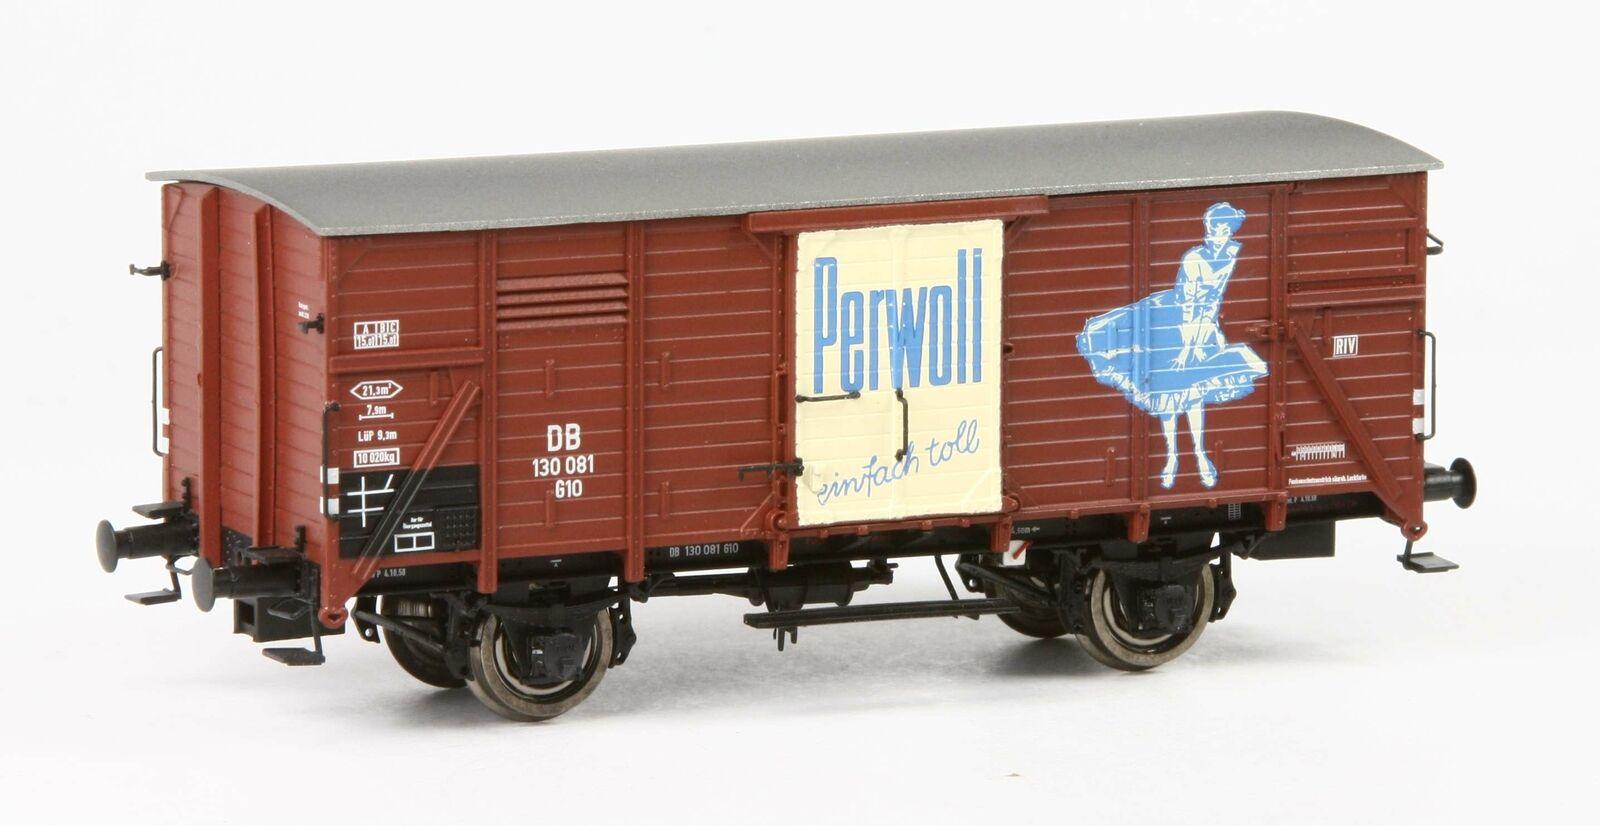 Brawa h0 49075 DB III g10 perwoll colección OVP